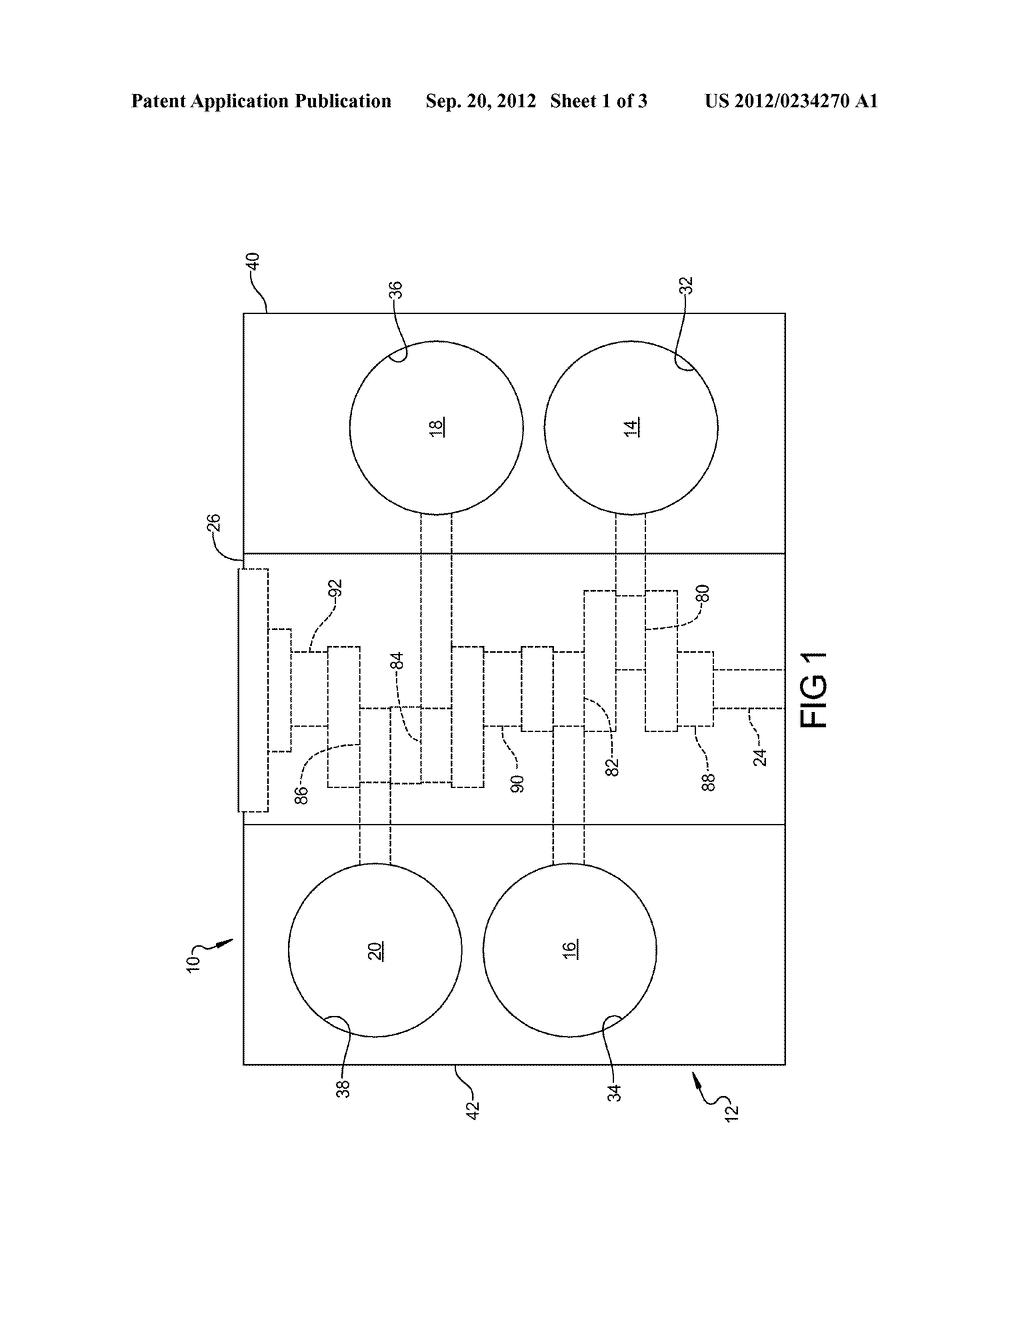 engine assembly including crankshaft for v4 arrangement diagram rh  patentsencyclopedia com 30 HP Wisconsin Engine V4